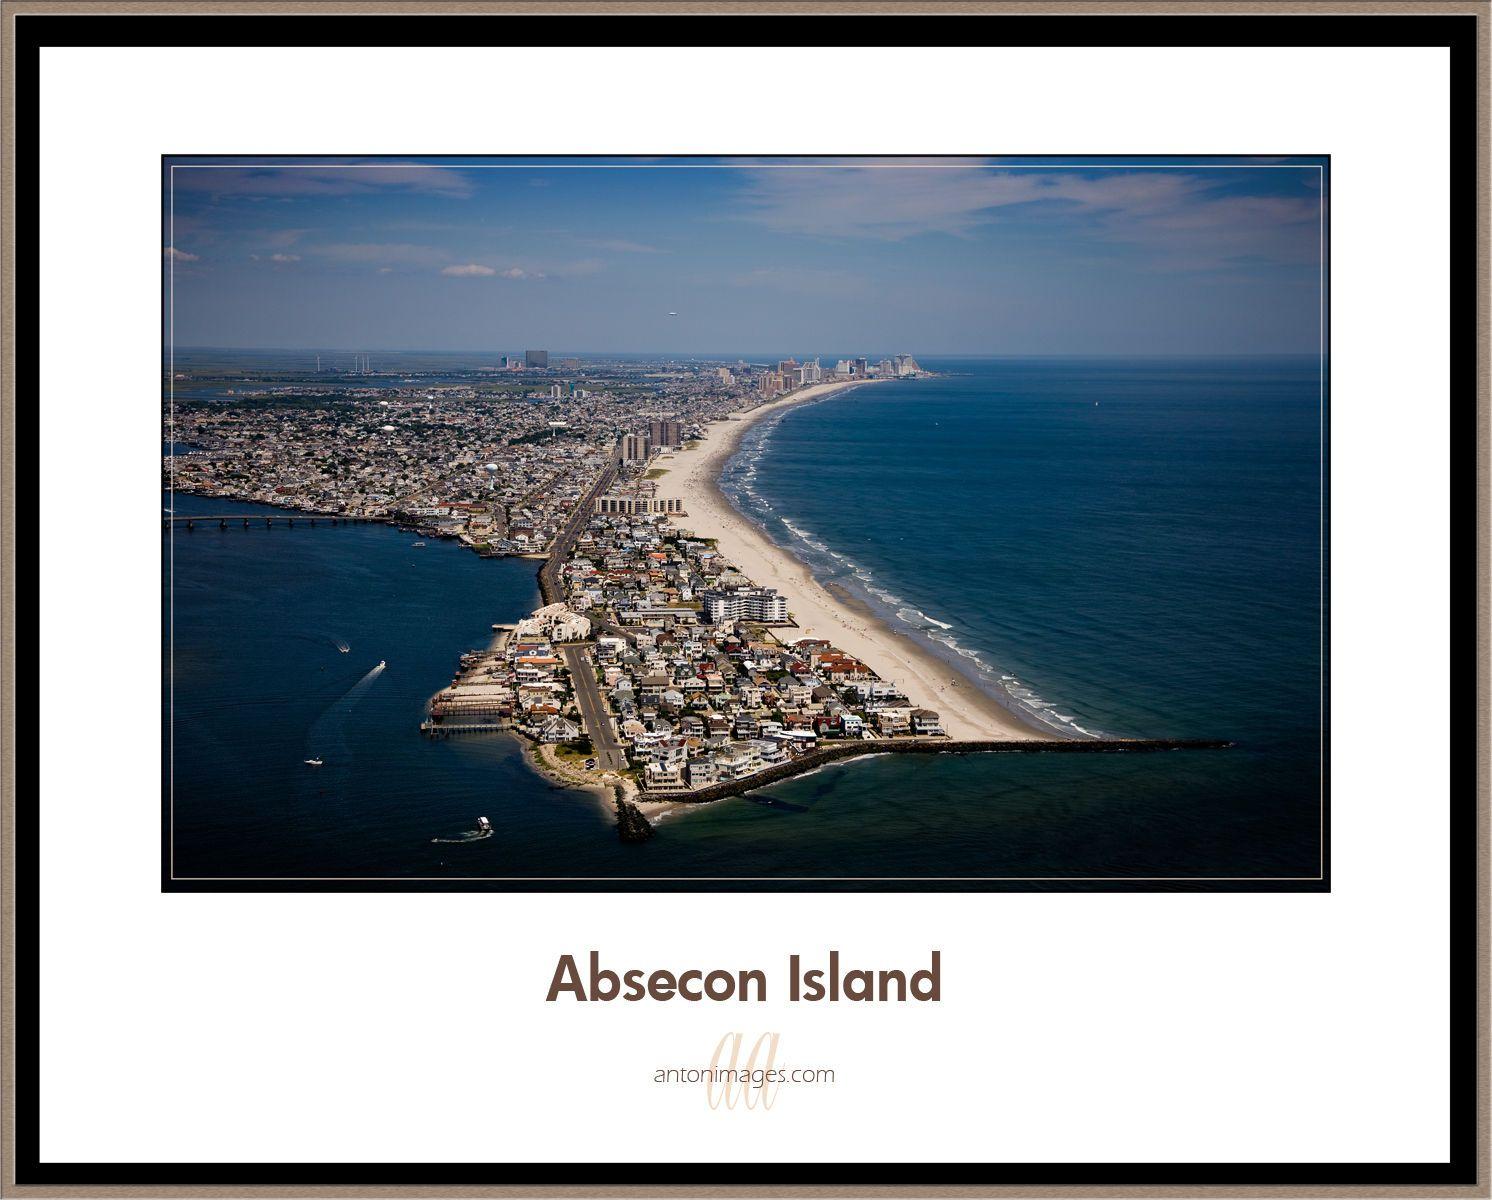 1absecon_island_.jpg